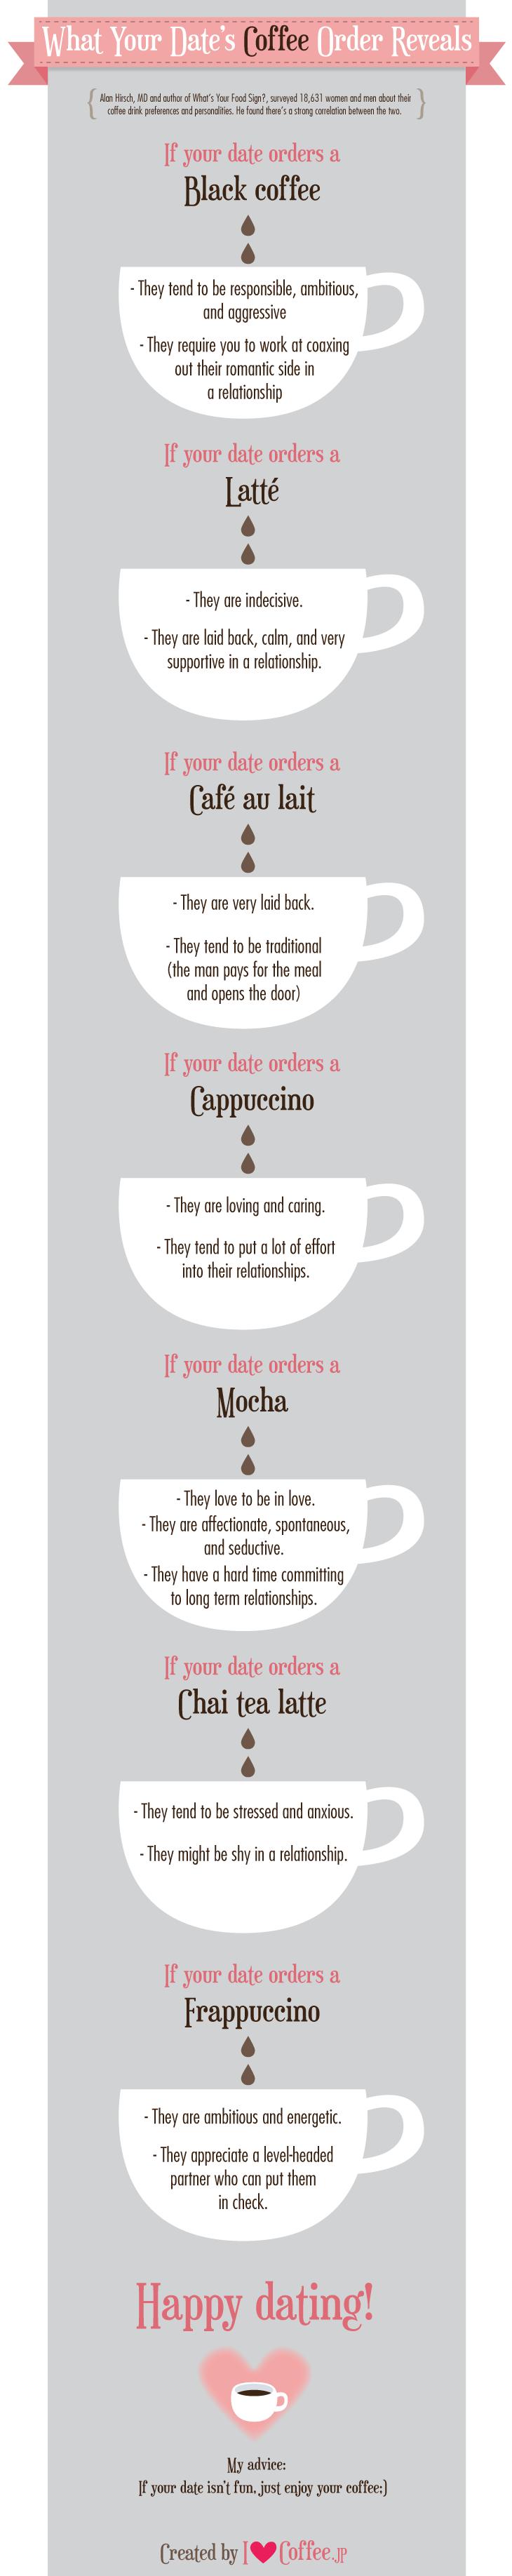 datecoffee